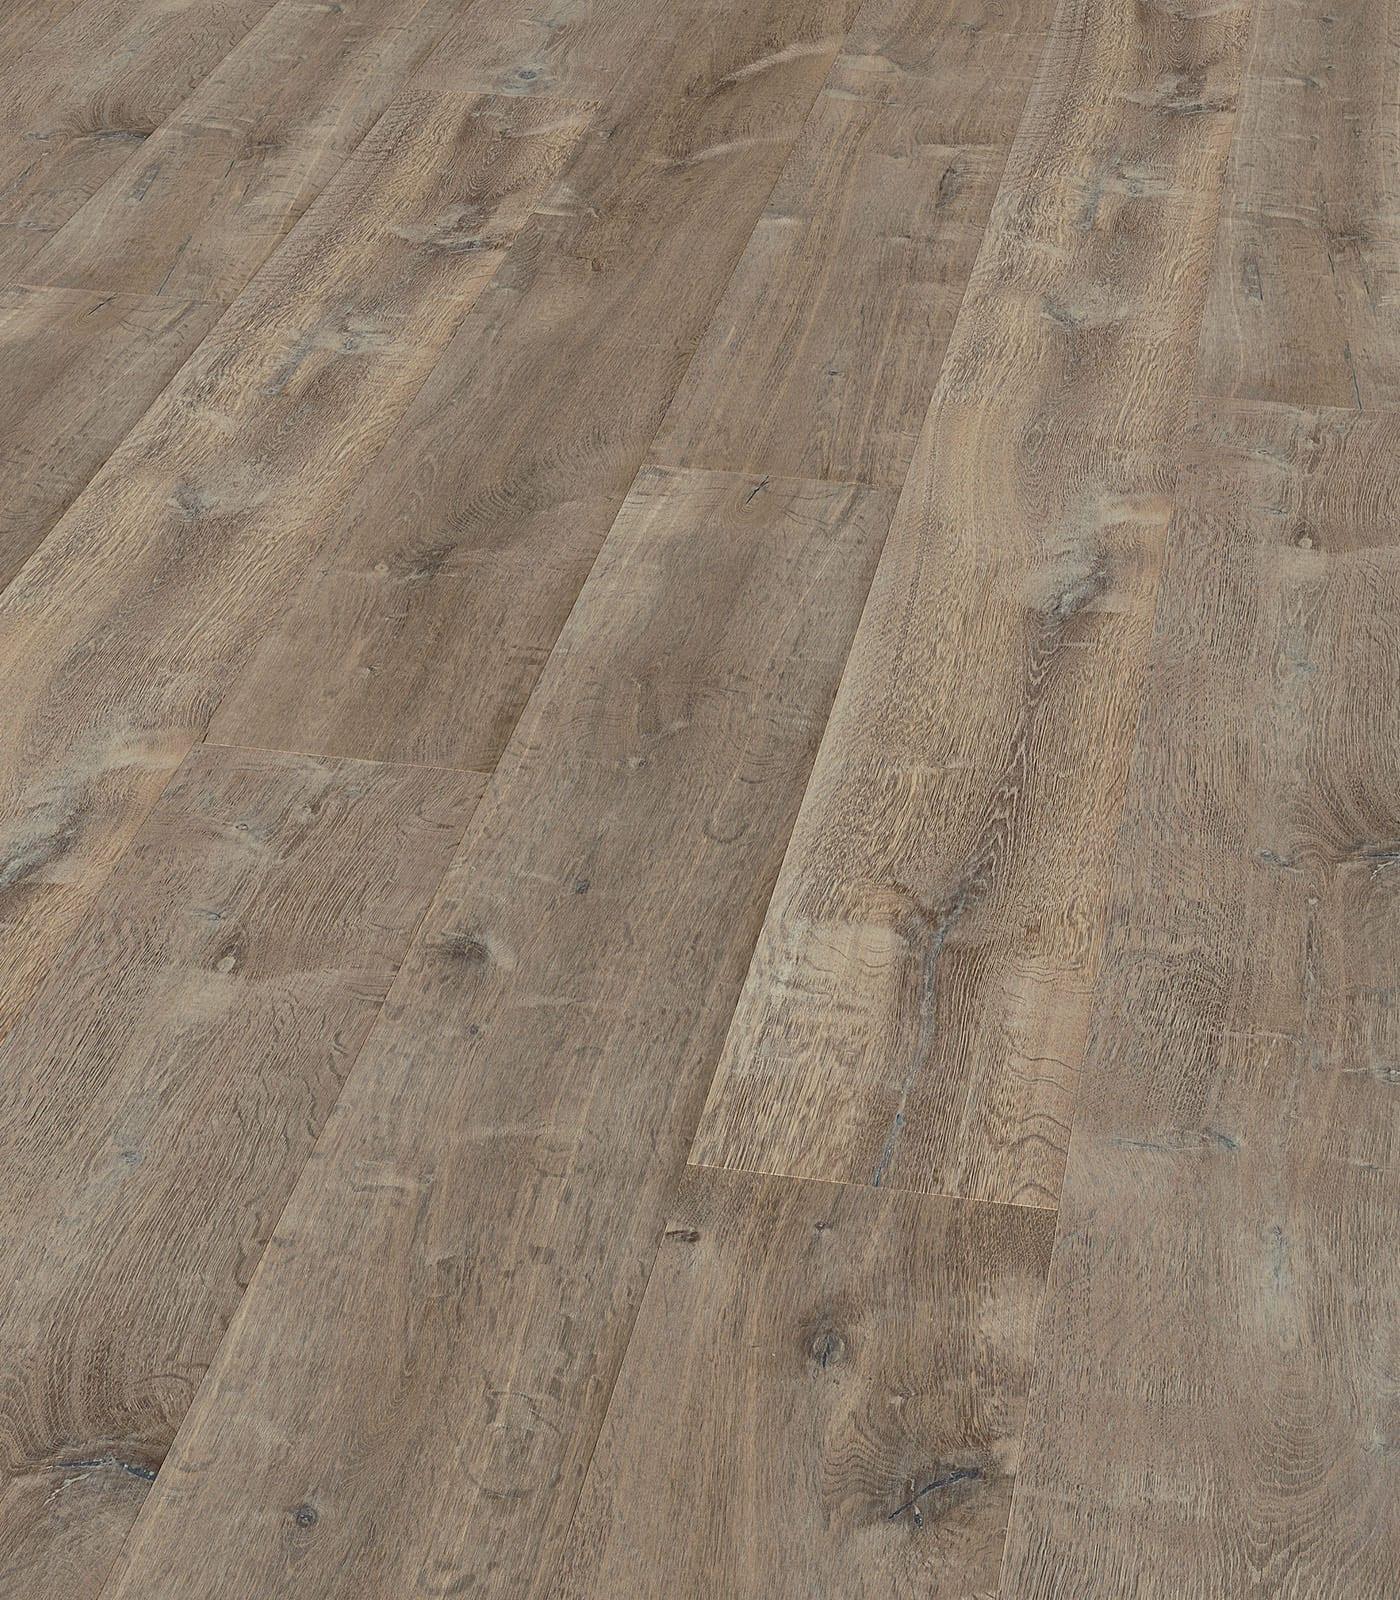 Bora Bora-European Oak Floors-Lifestyle collection-angle